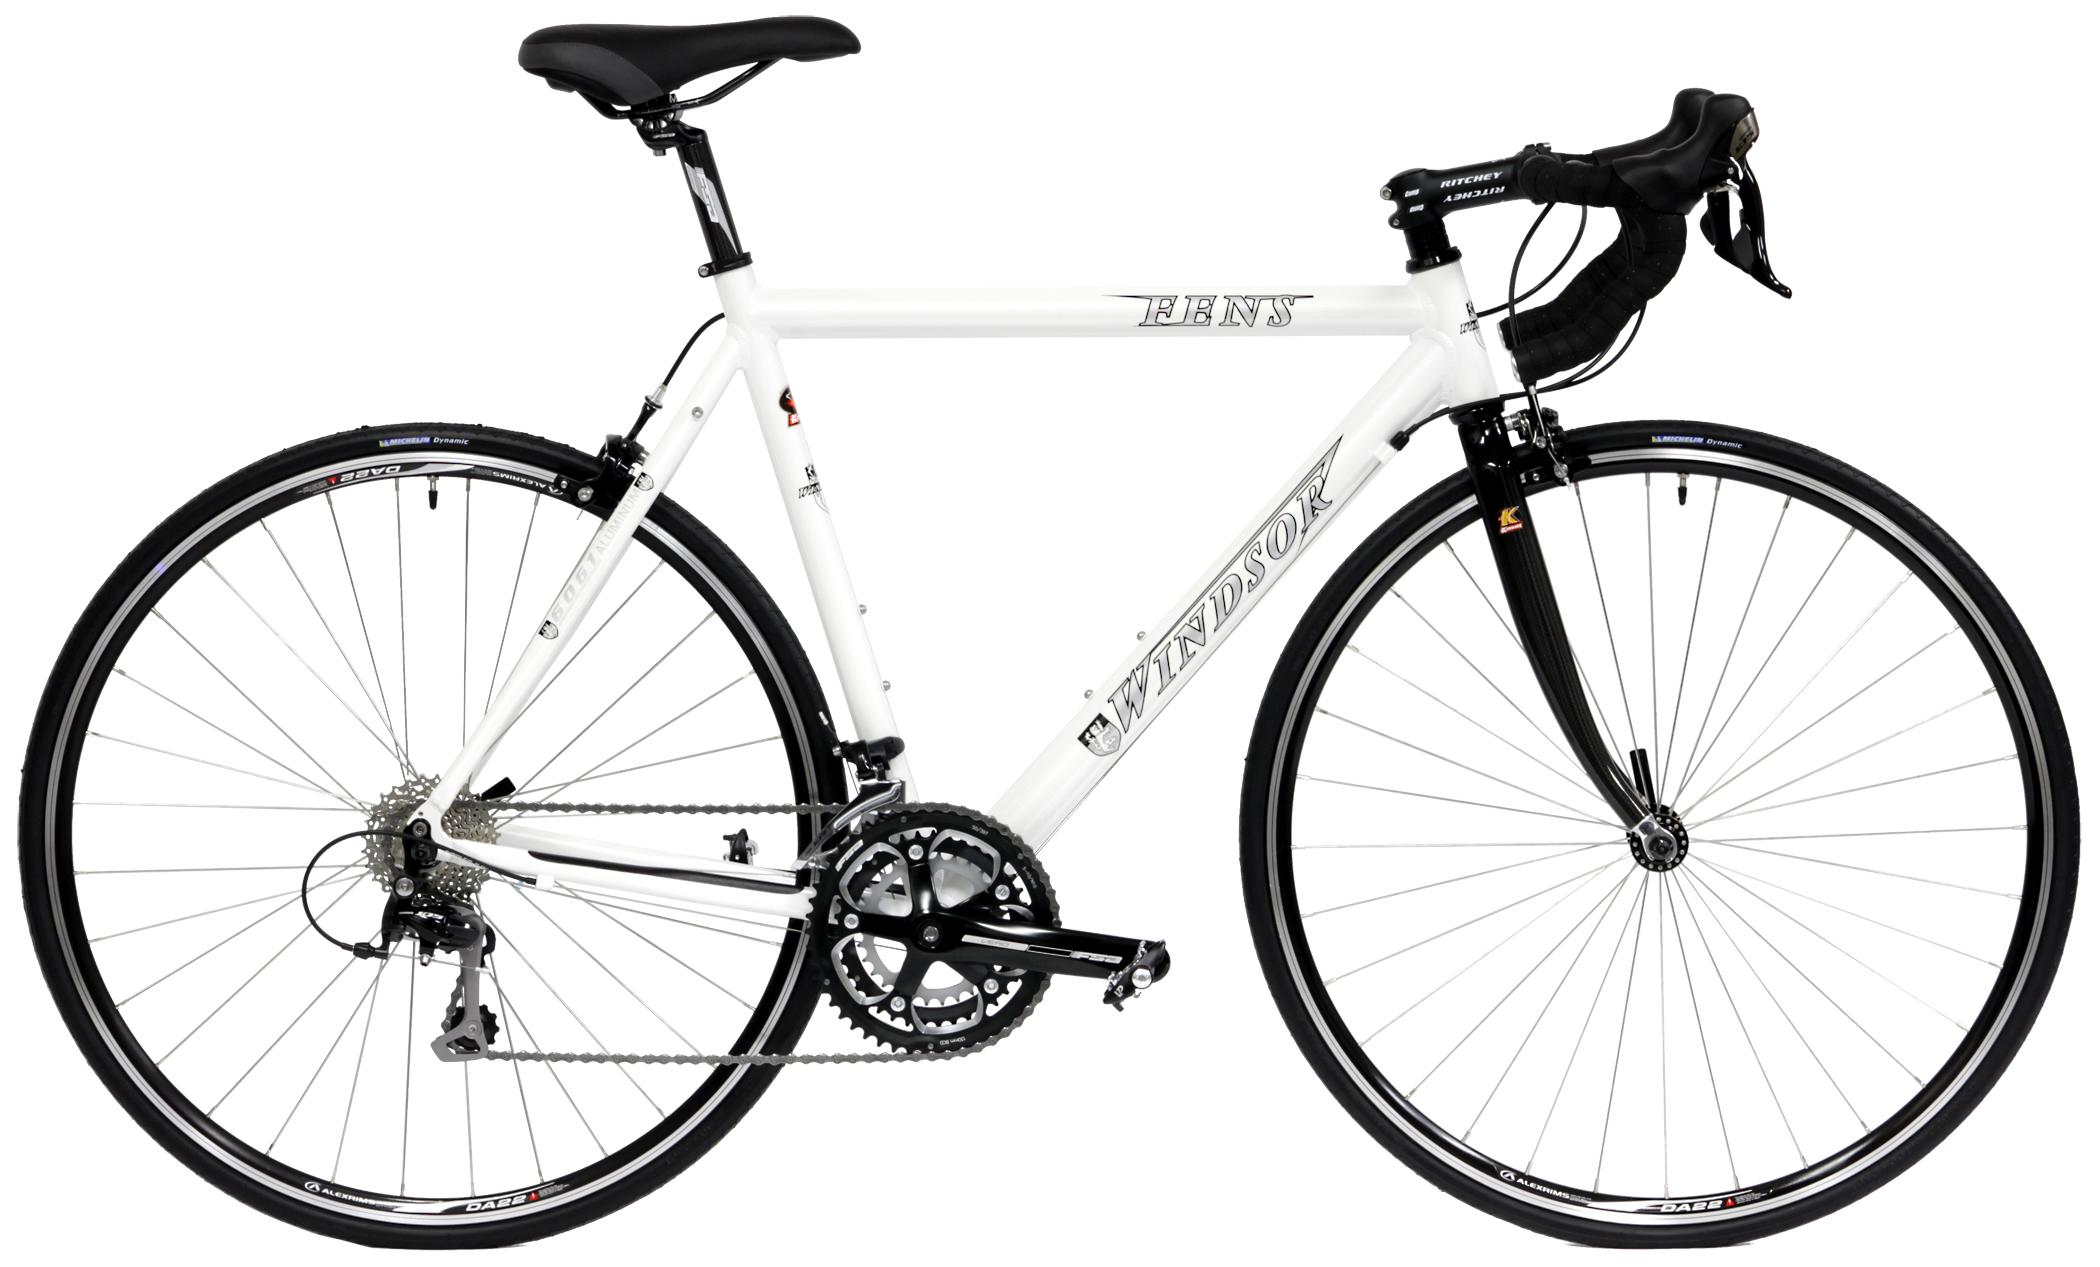 Bike clipart road bike. Save up to off